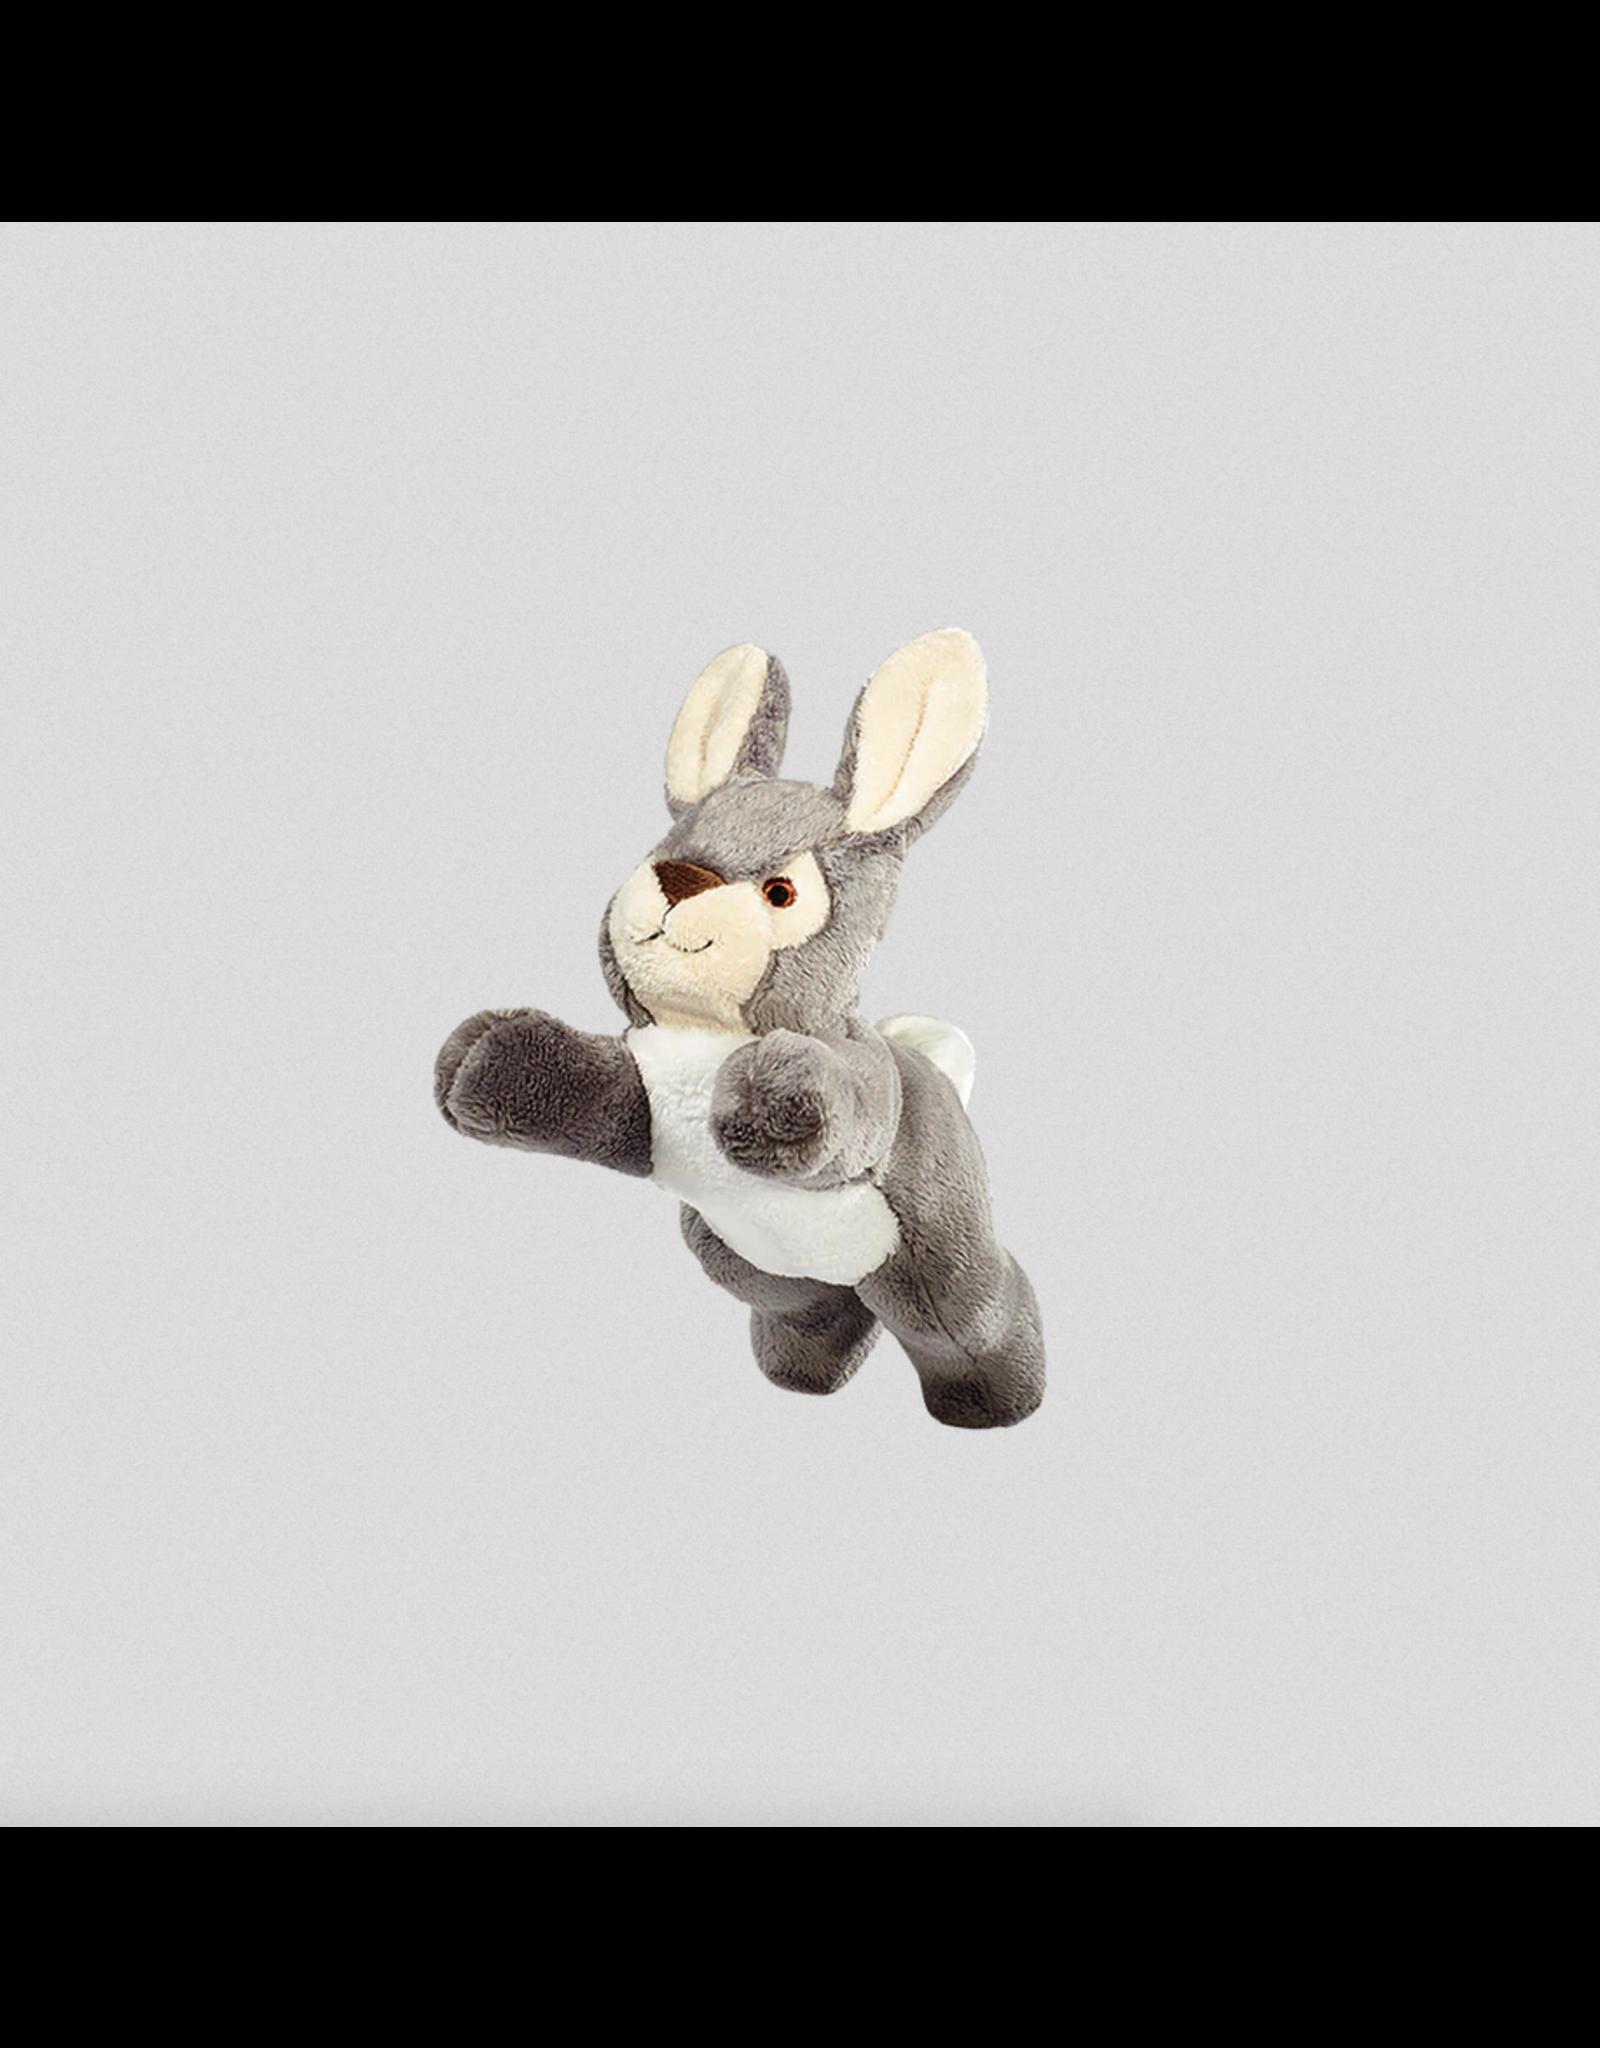 Fluff and Tuff Fluff and Tuff Jessica Rabbit